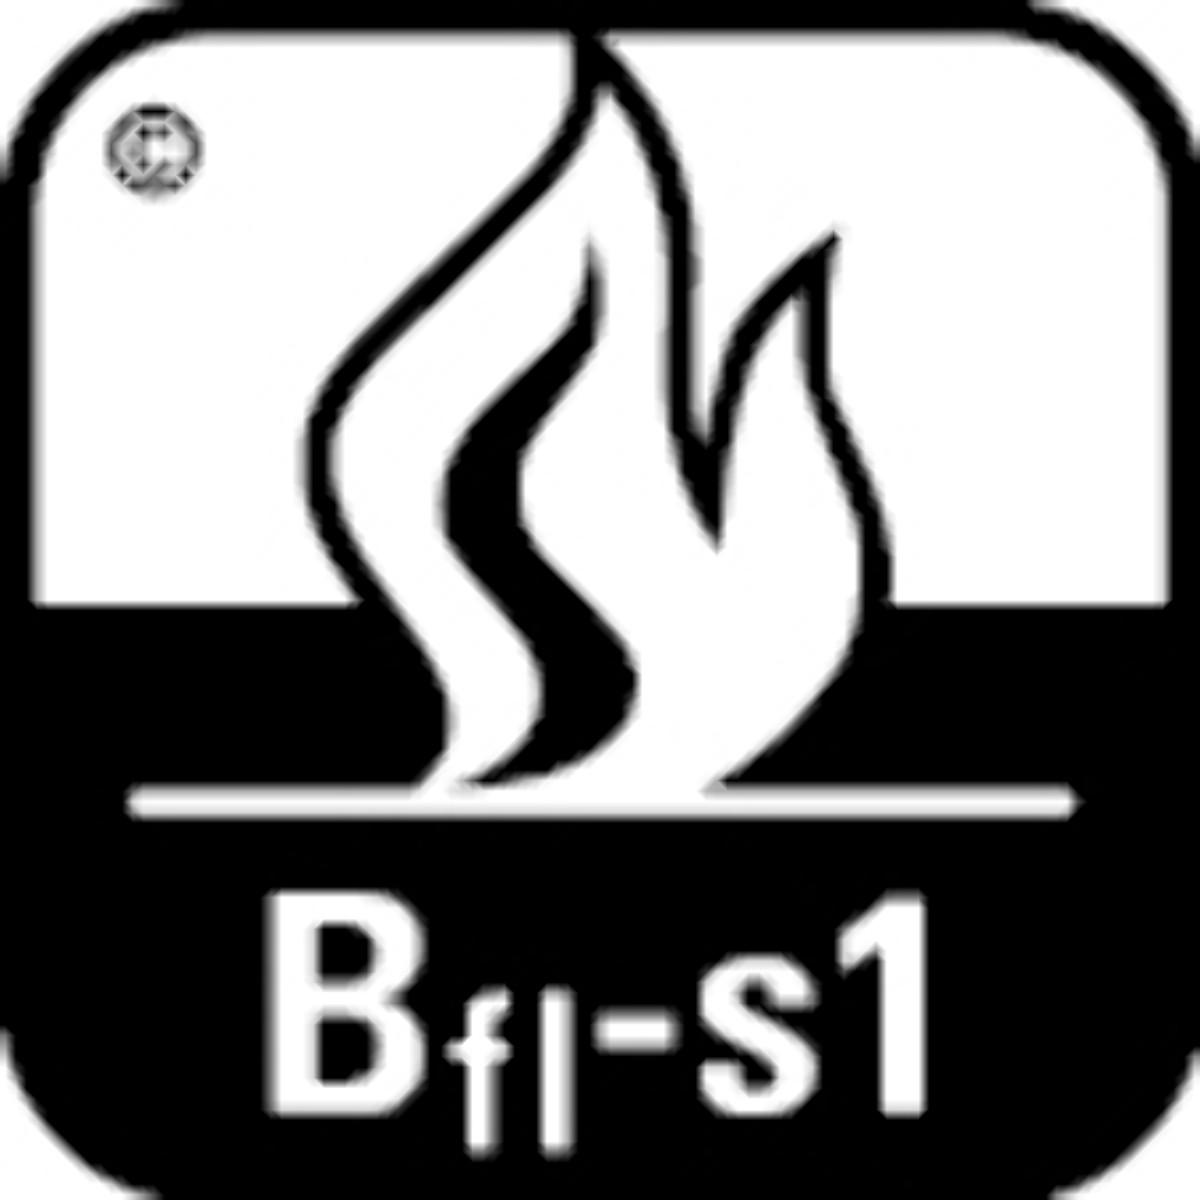 Brandklasse B-fl S1